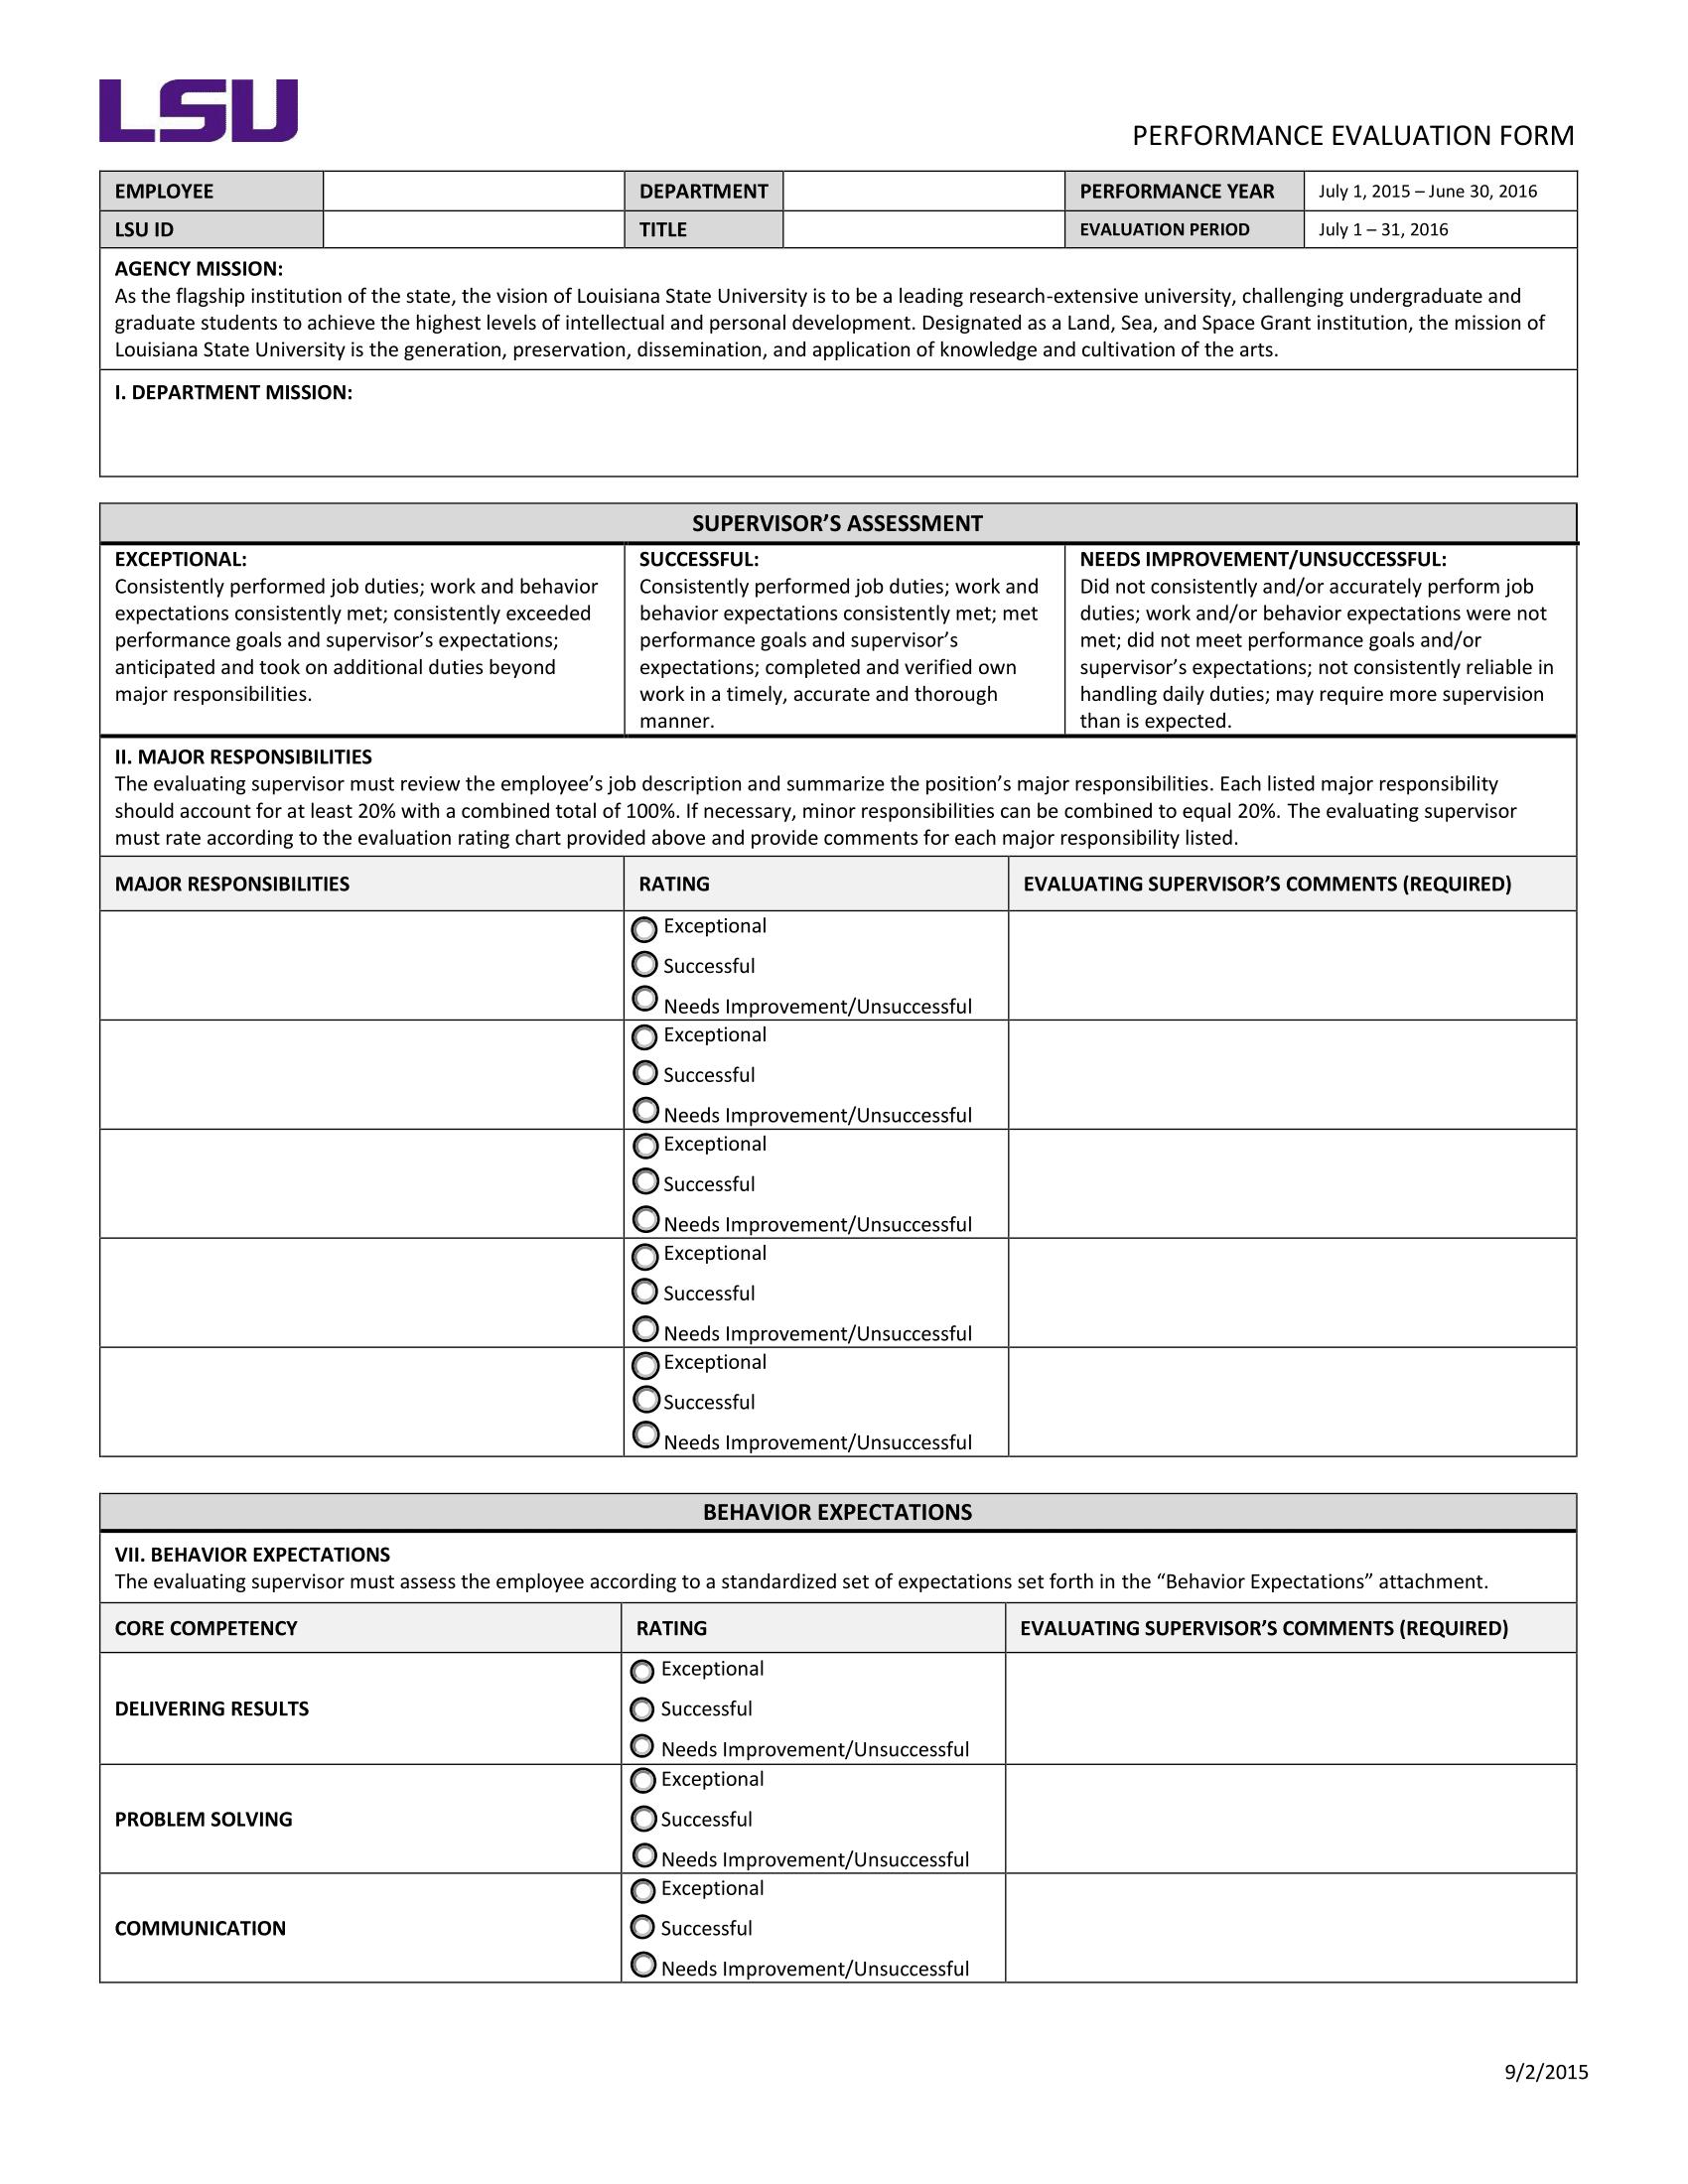 General Performance Evaluation Form